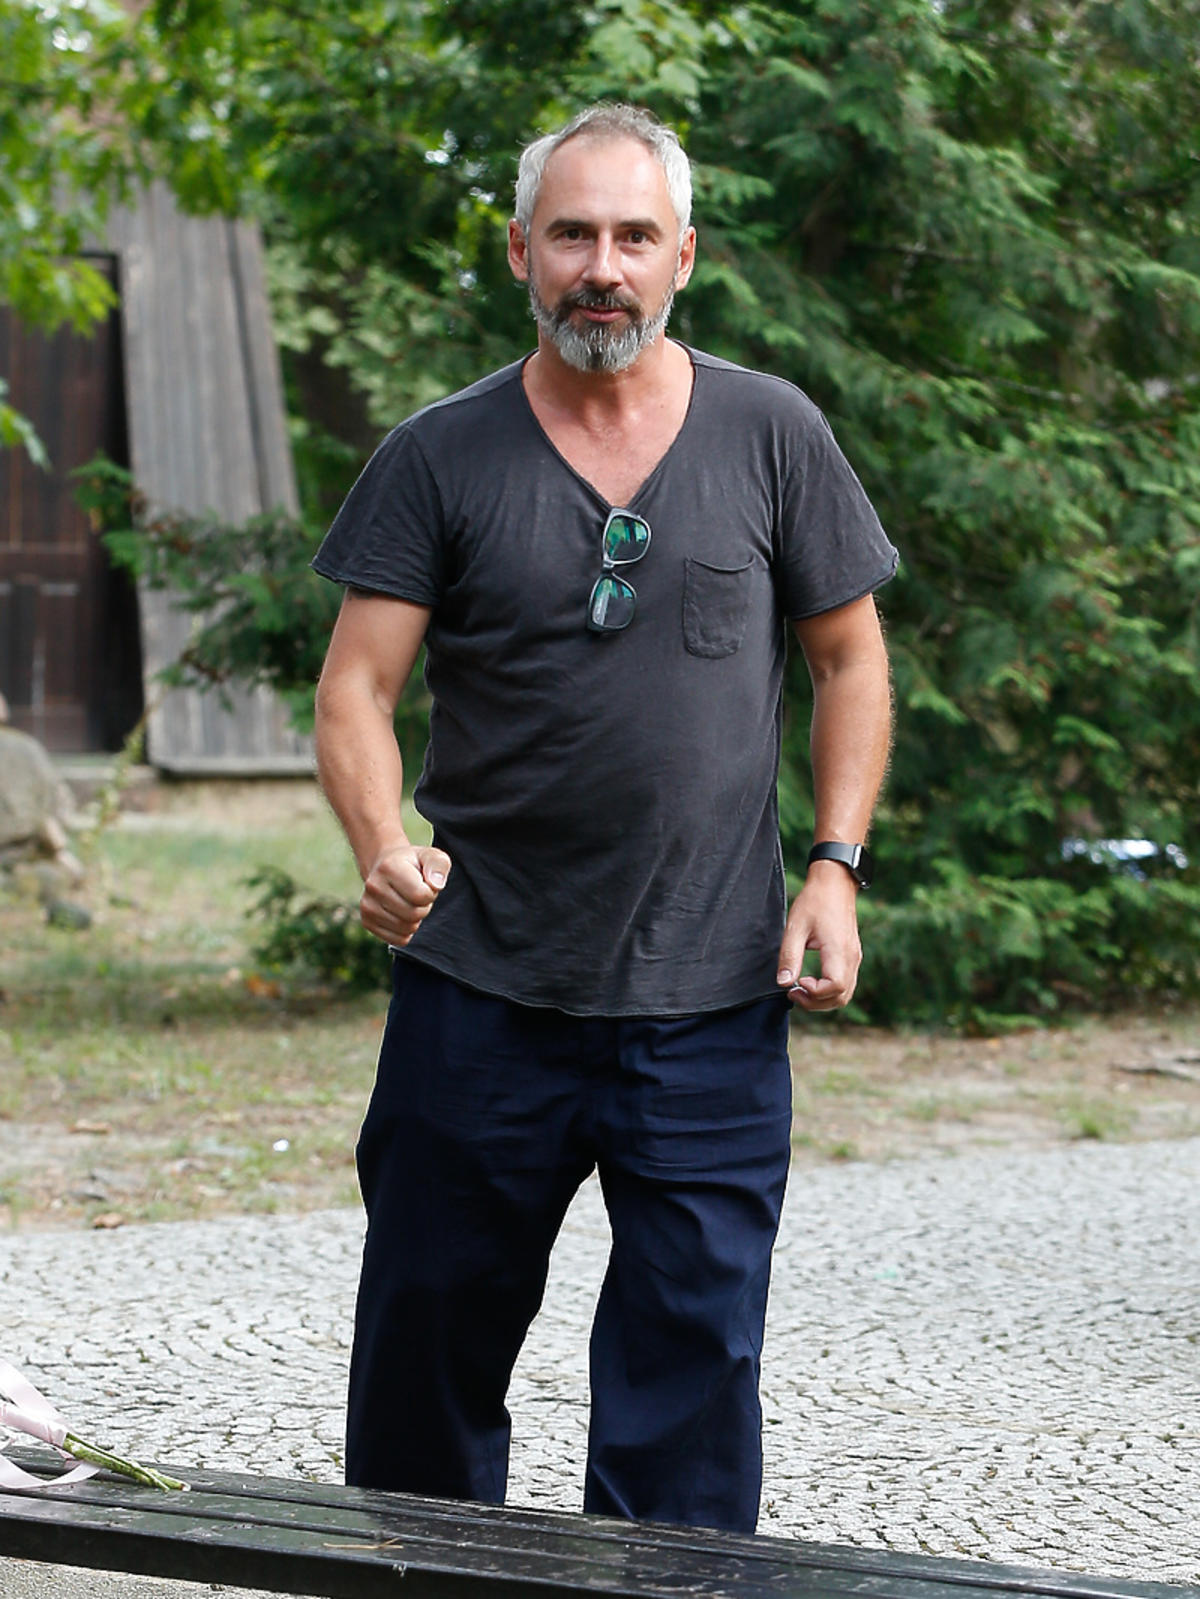 Jacek Kopczyński na ślubie aktorkiej pary z Na Wspólnej